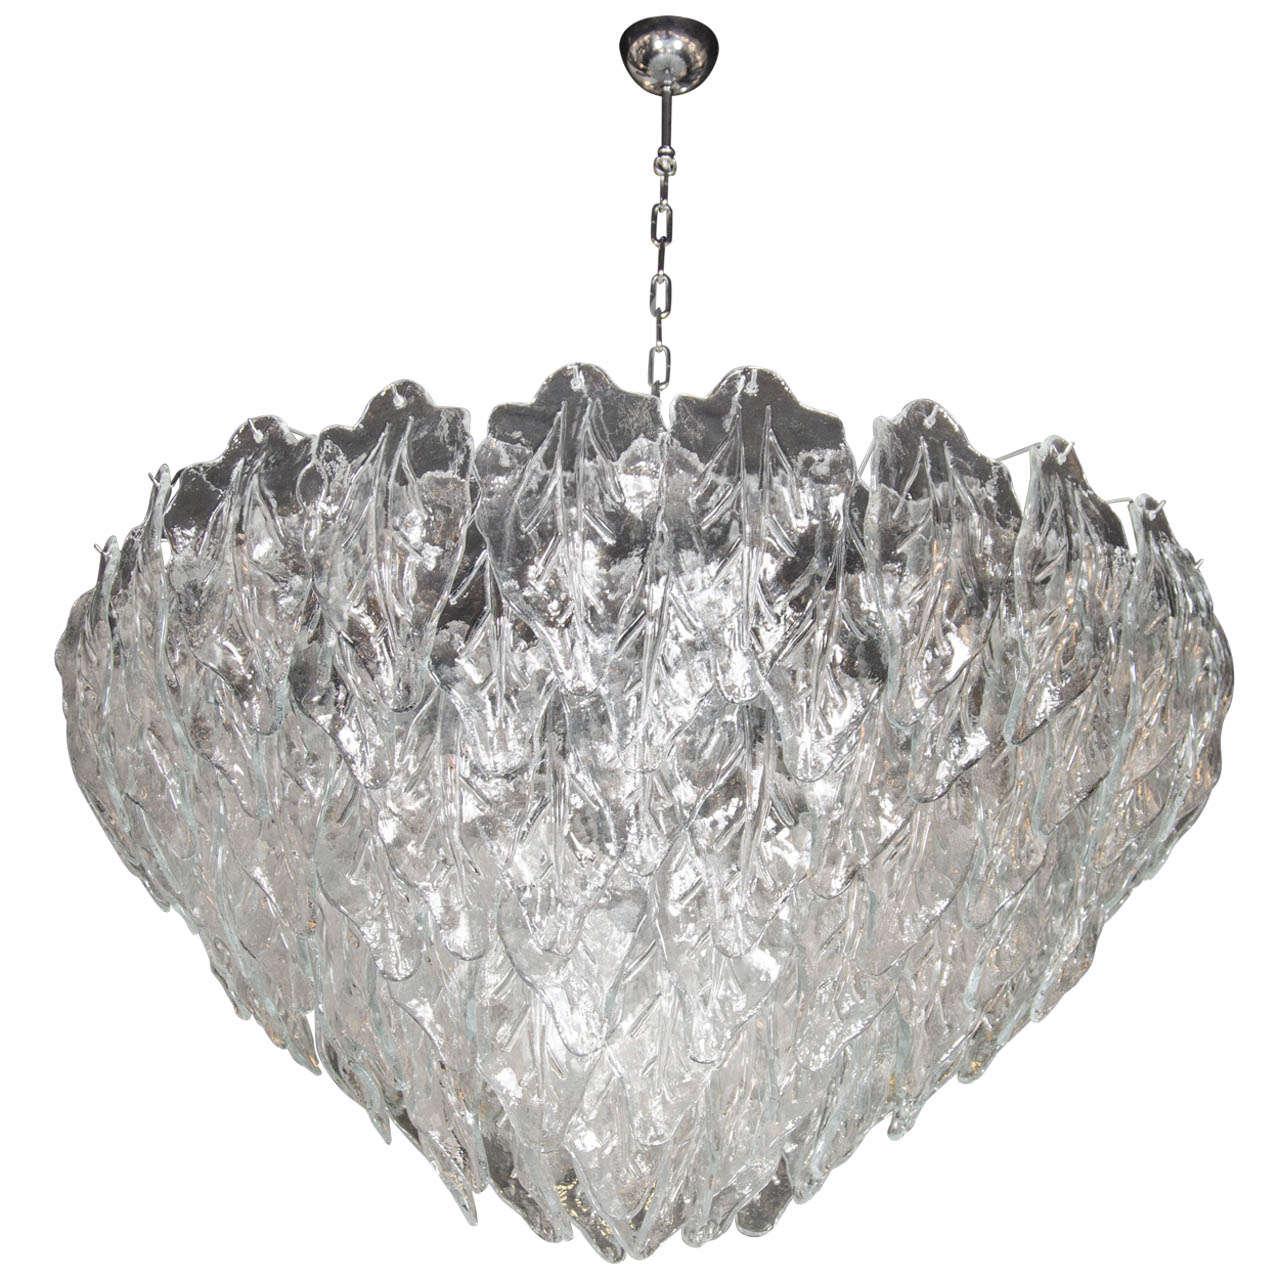 Opulent murano hand blown glass leaf chandelier at 1stdibs opulent murano hand blown glass leaf chandelier for sale arubaitofo Choice Image